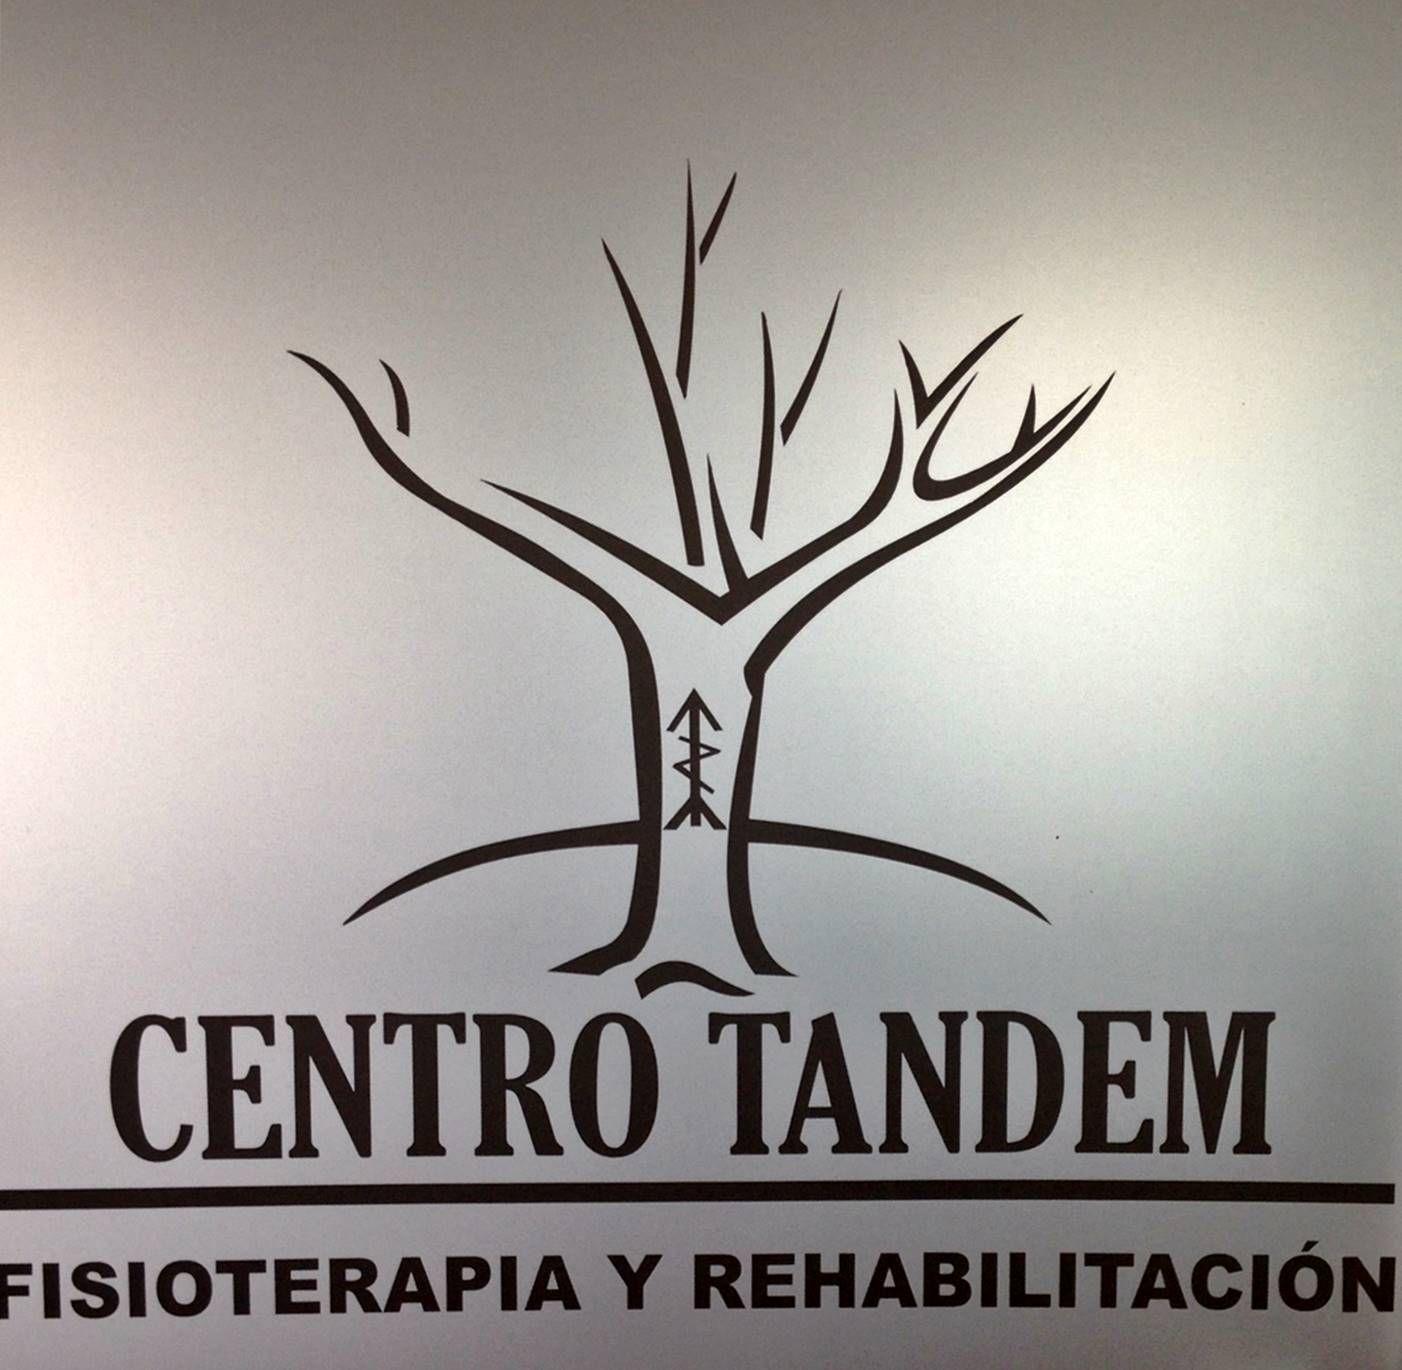 Centro Tándem: objetivo felicidad